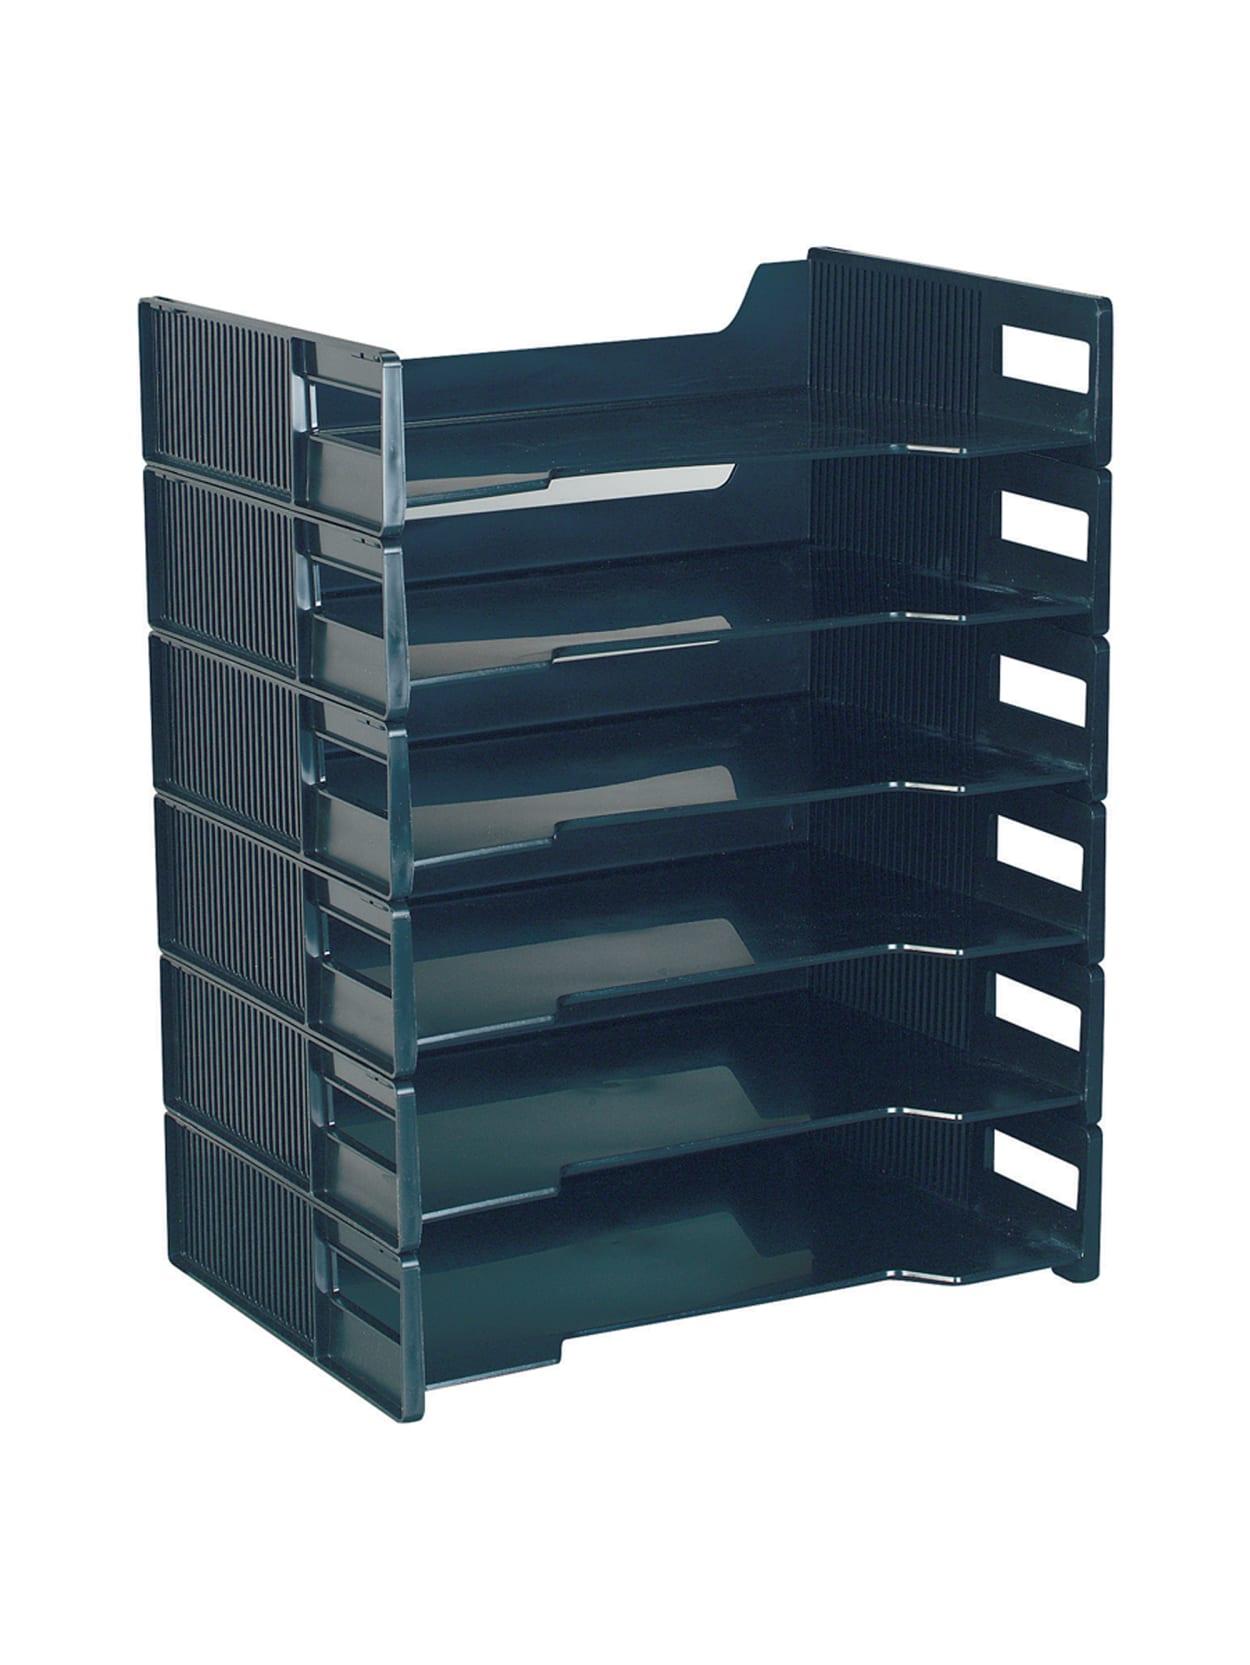 Innovative Storage Designs Stackable Letter Trays, Black, Pack Of 48 Item #  348481548